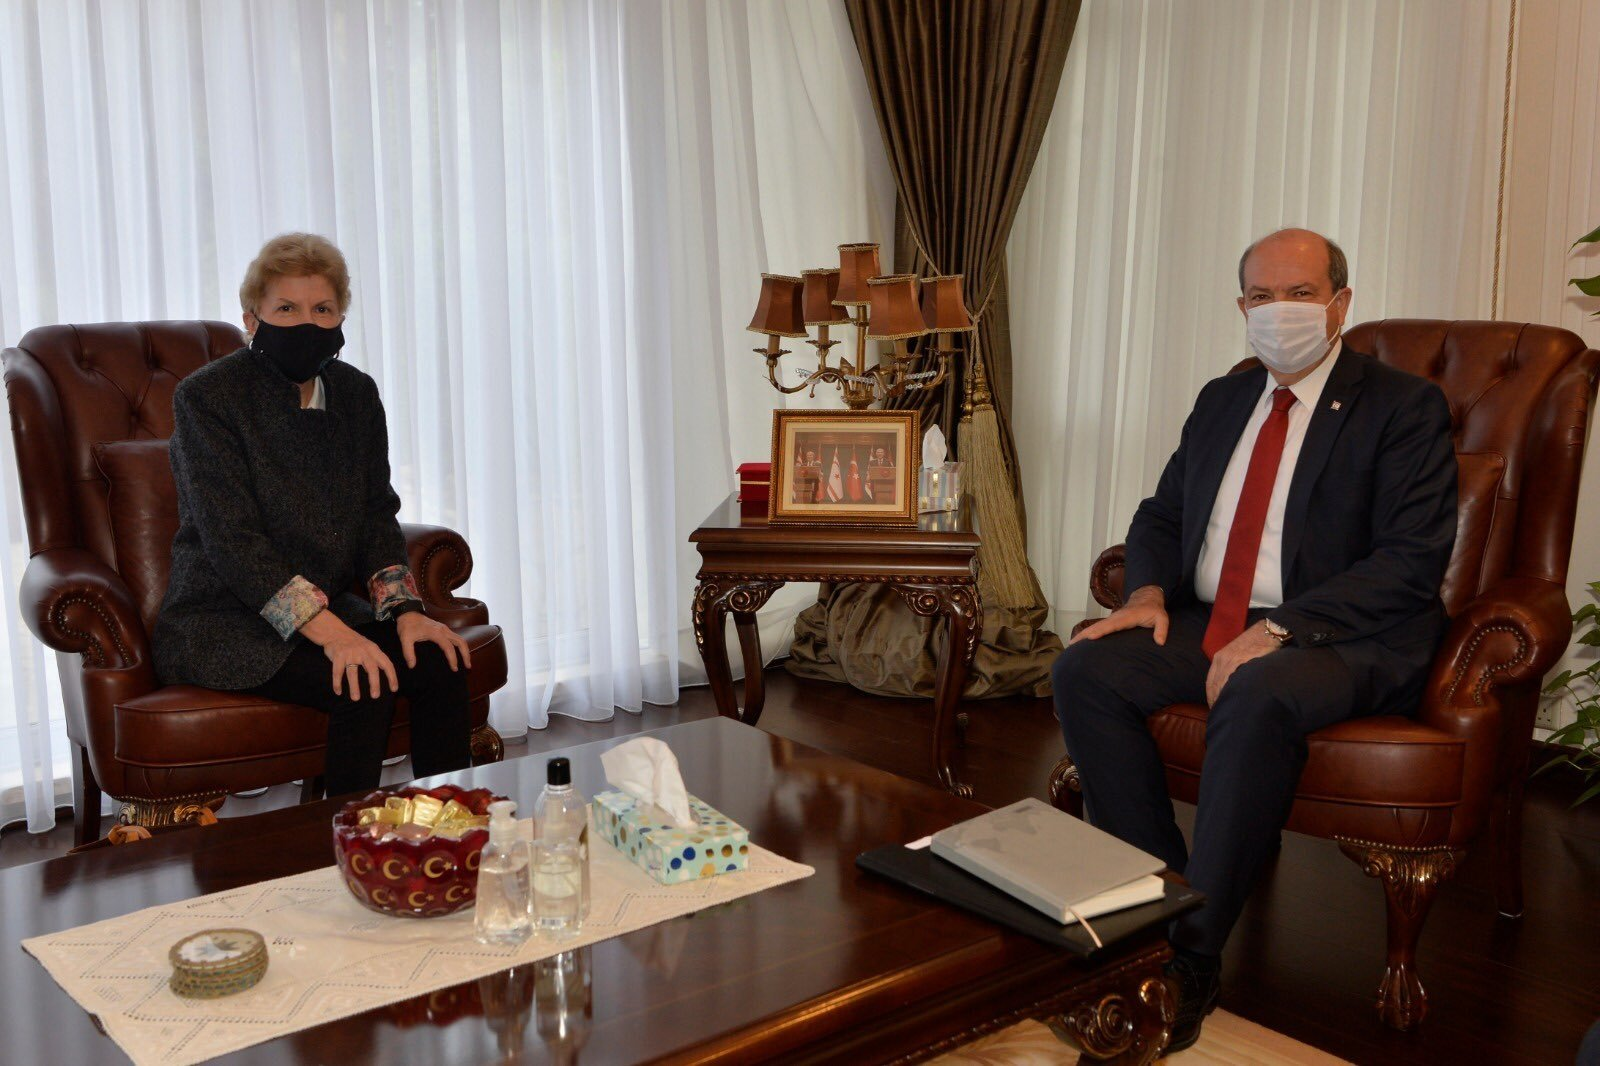 Turkish Republic of Northern Cyprus (TRNC) President Ersin Tatar (R) meets with U.N. envoy Jane Holl Lute in Lefkoşa (Nicosia), TRNC, Jan. 11, 2020. (AA Photo)